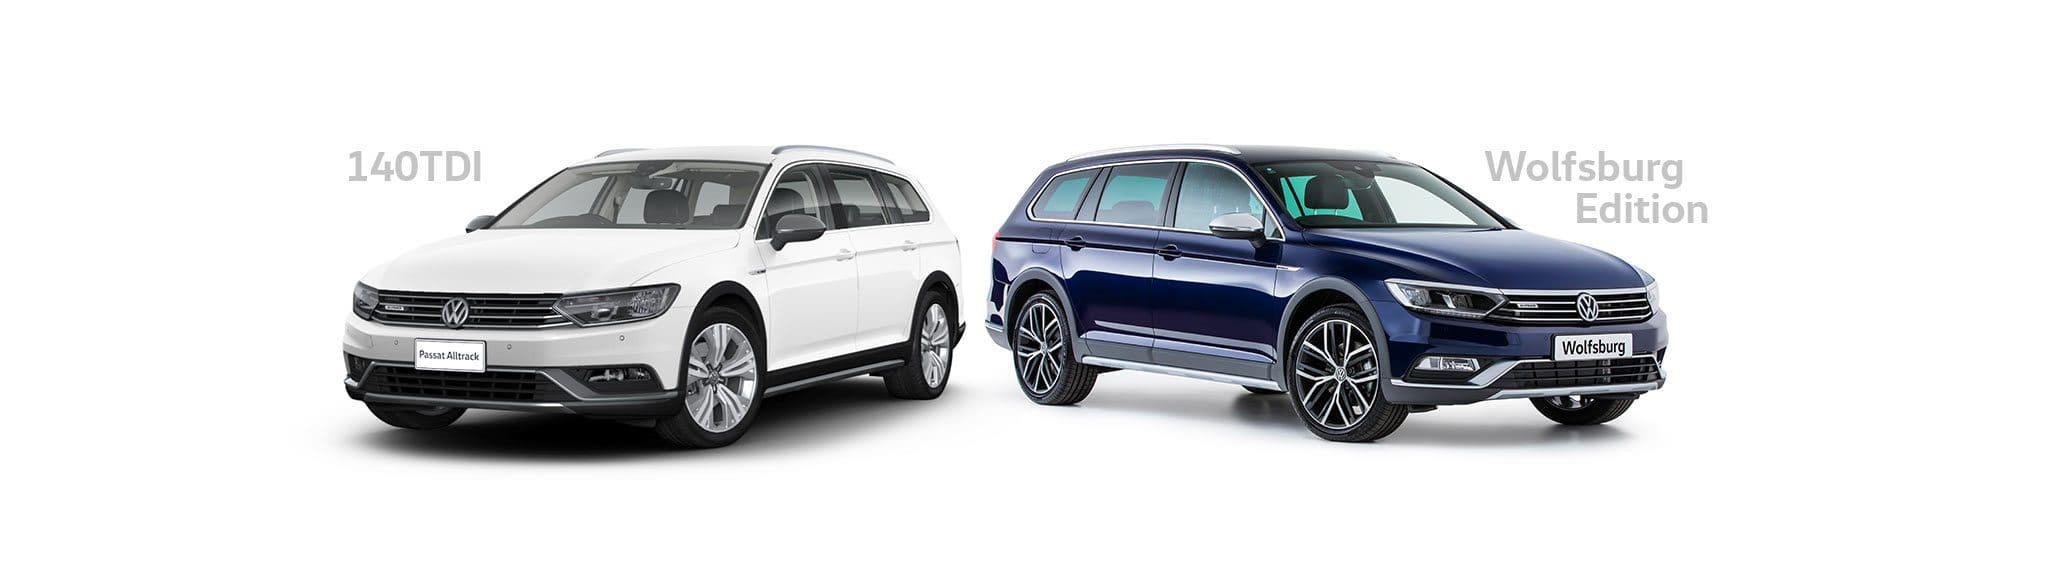 Passat Alltrack Duttons Volkswagen